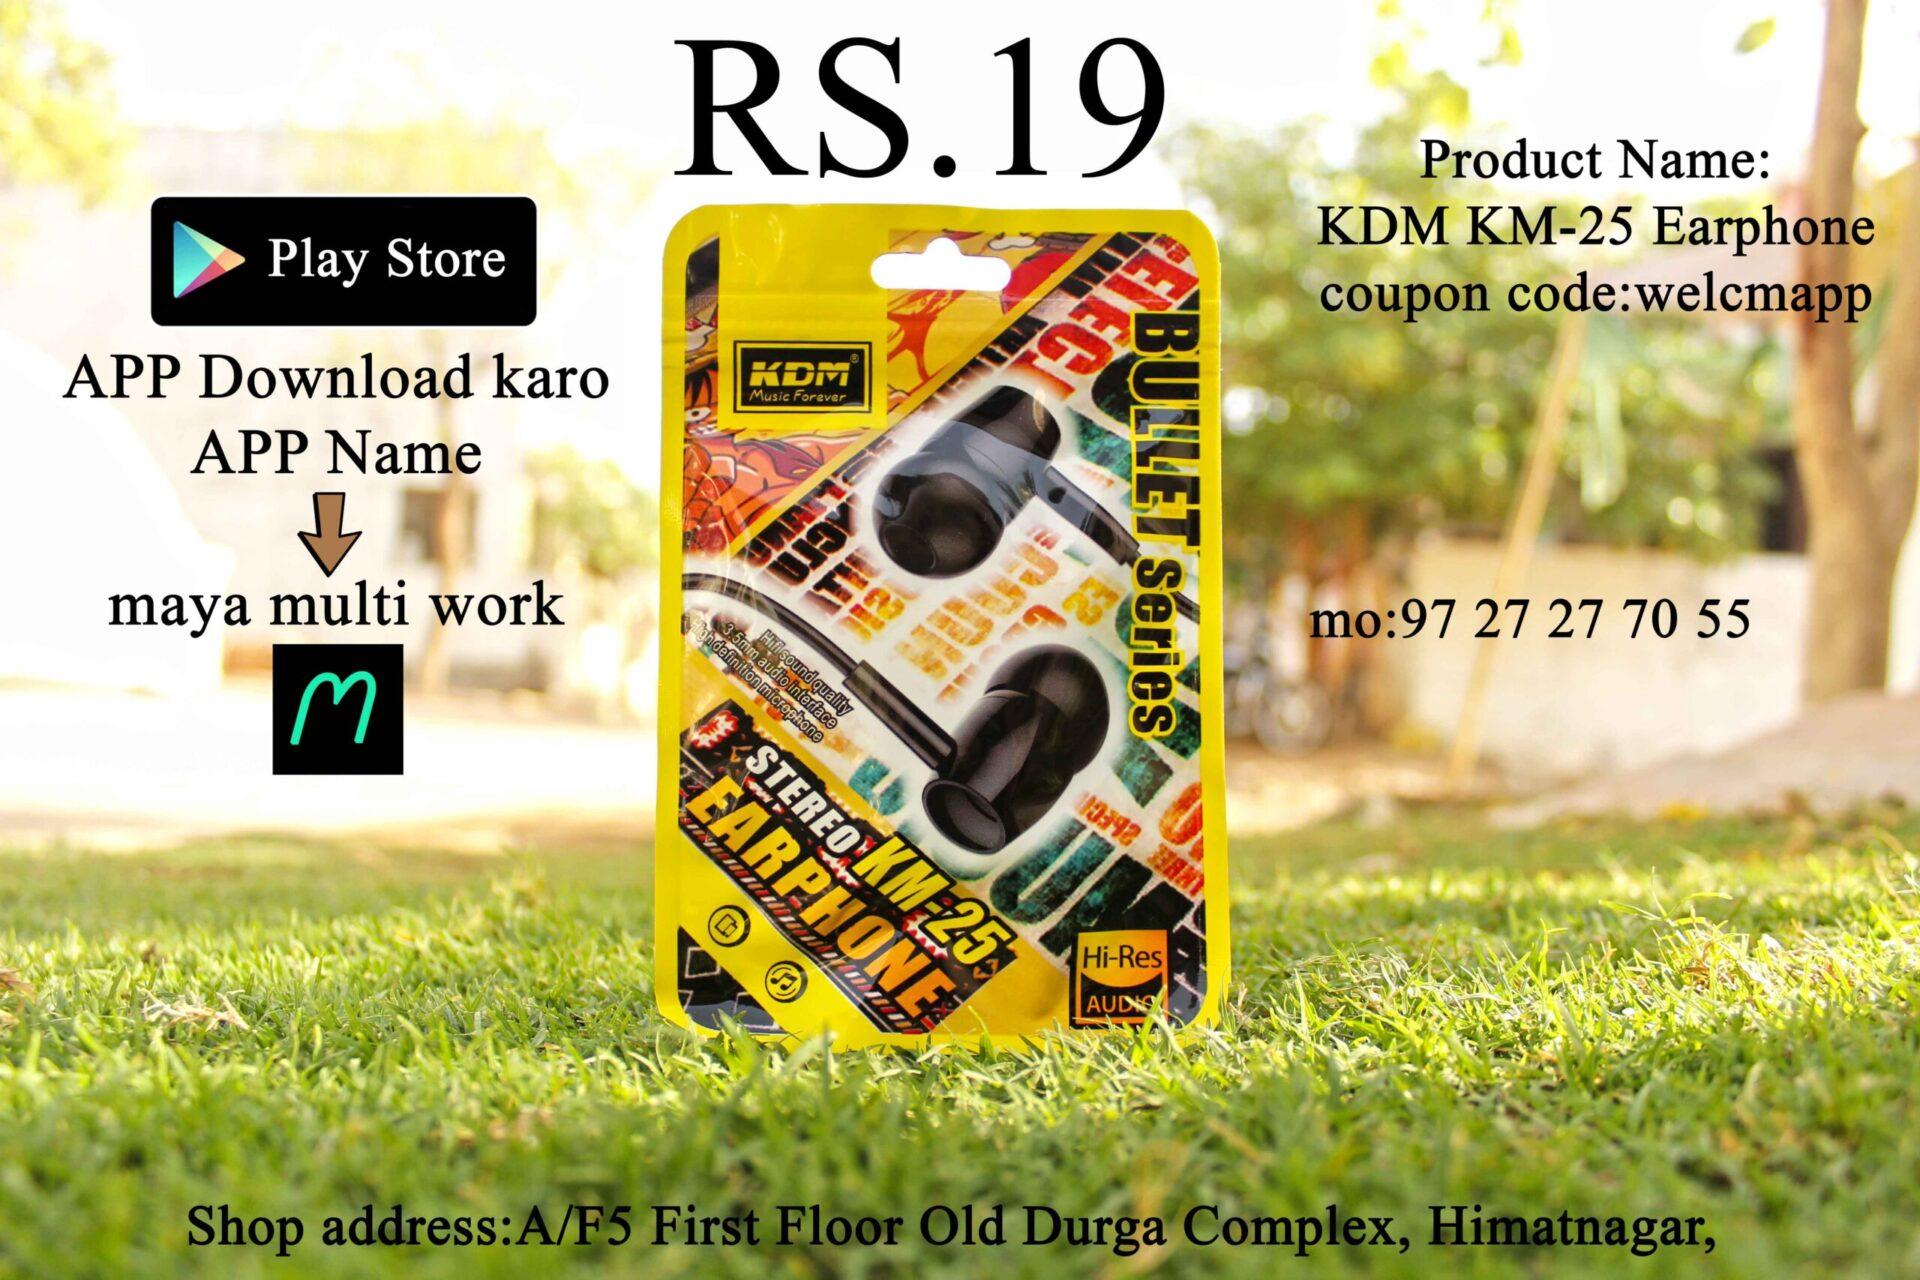 KDM KM-25 Earphone RS.19(coupon code:welcmapp)